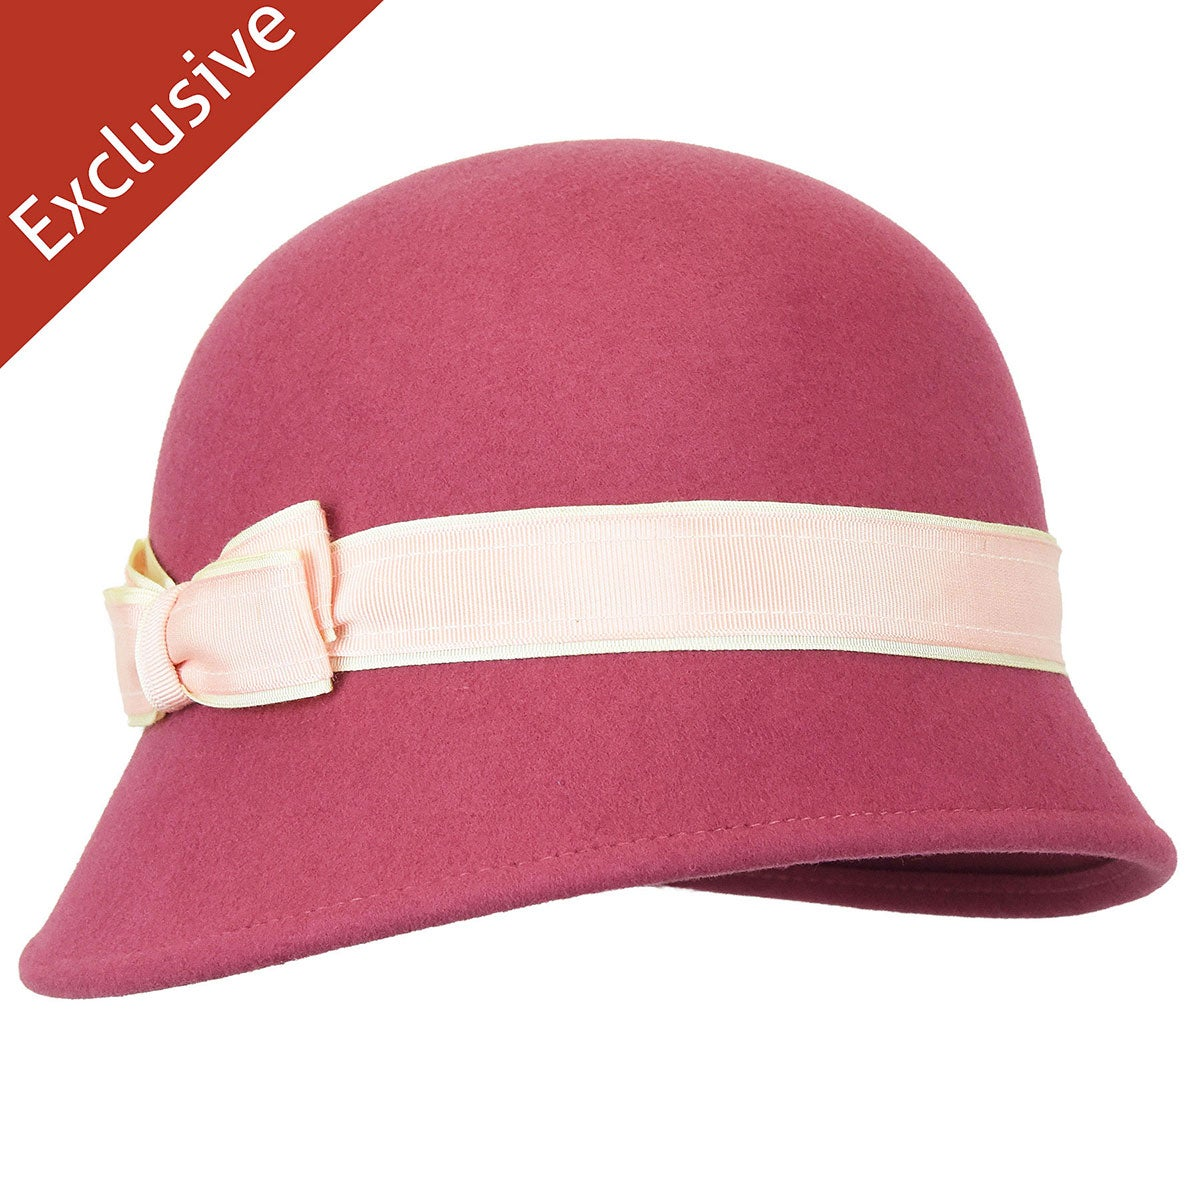 1930s Style Hats   Buy 30s Ladies Hats Clara Cloche $72.50 AT vintagedancer.com